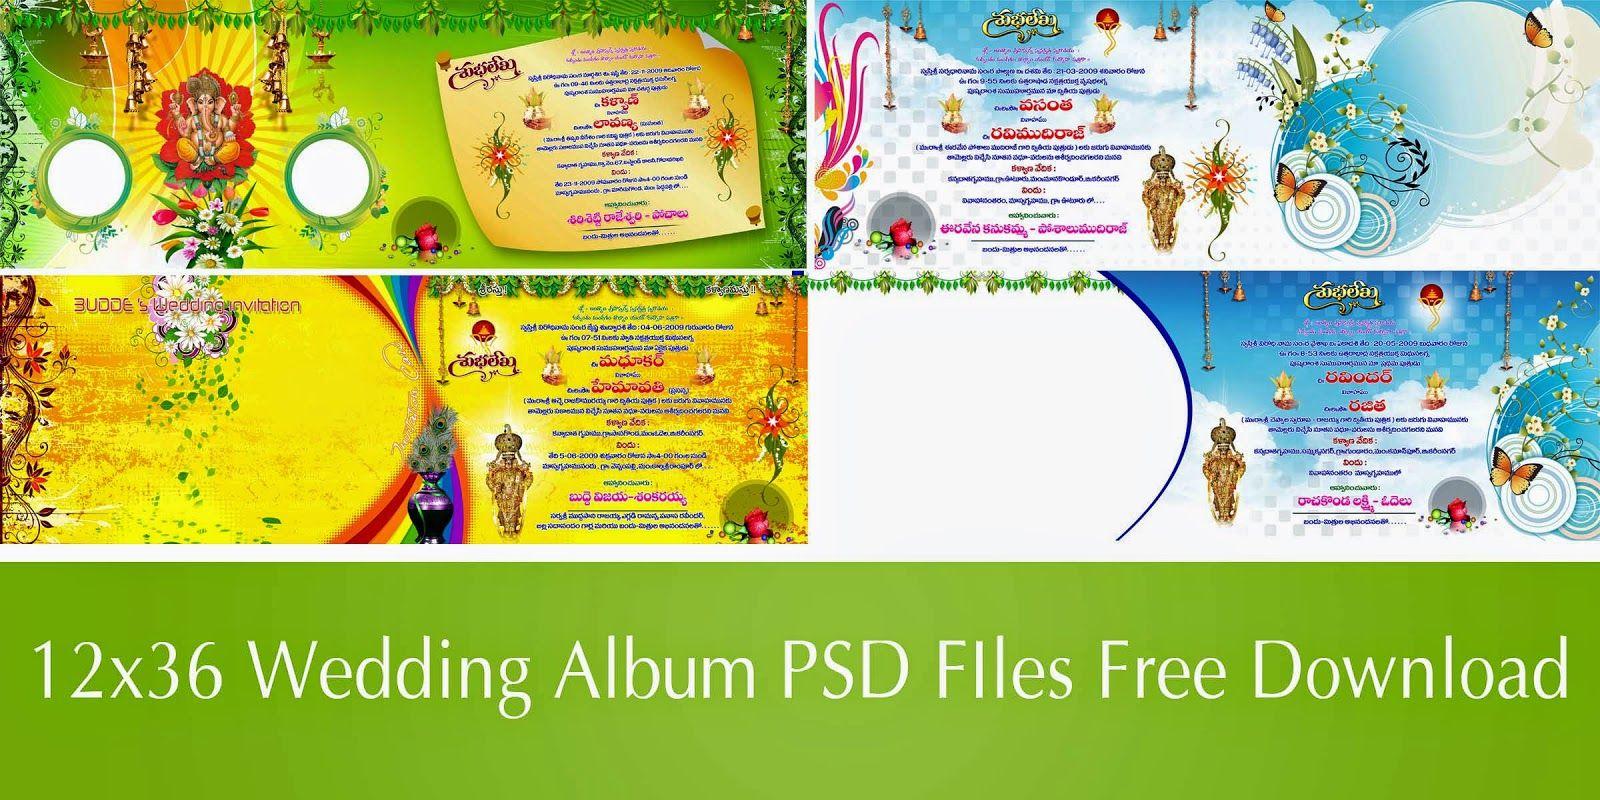 12x36 Album PSD Files Free Download